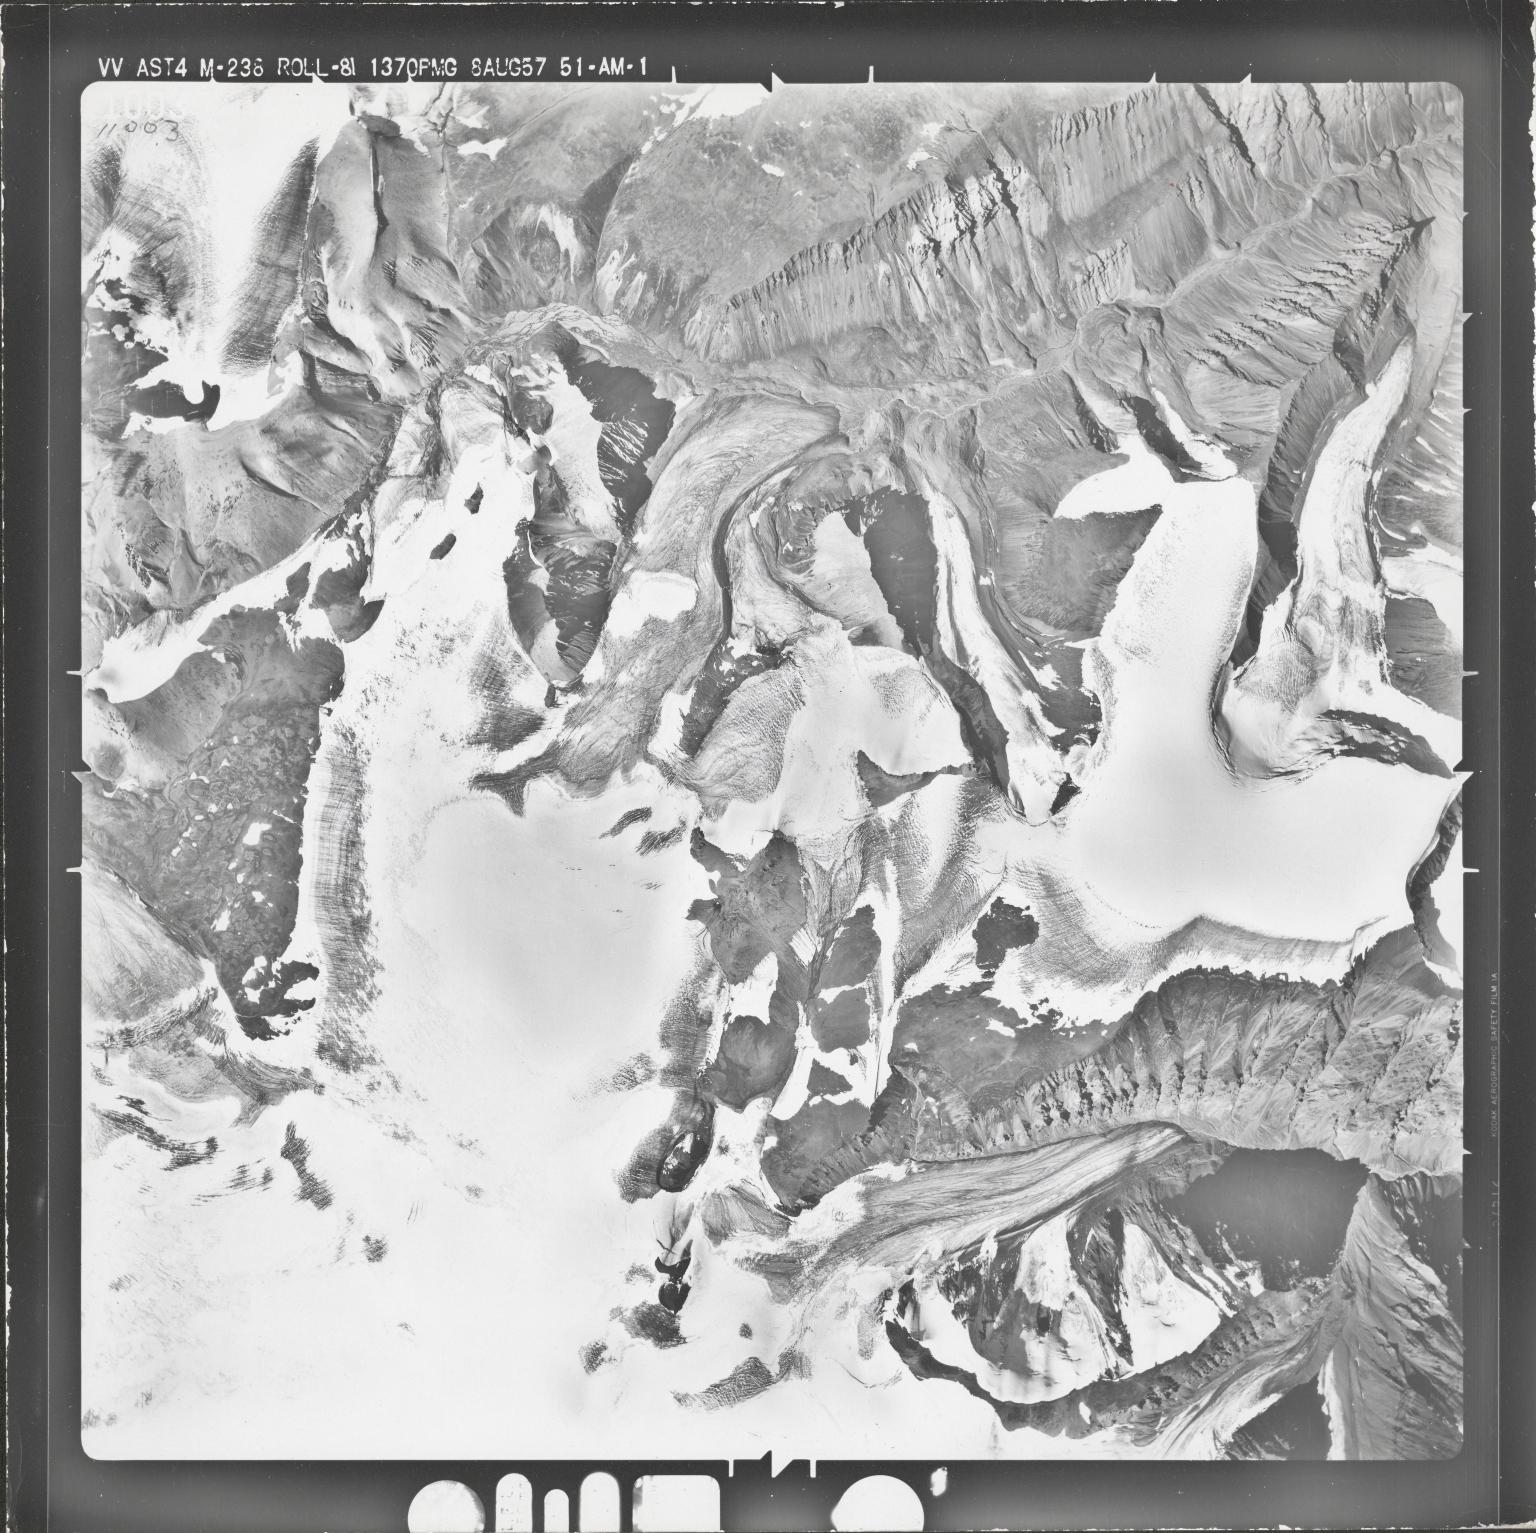 Mount Gordon, aerial photograph M 238 11003, Alaska